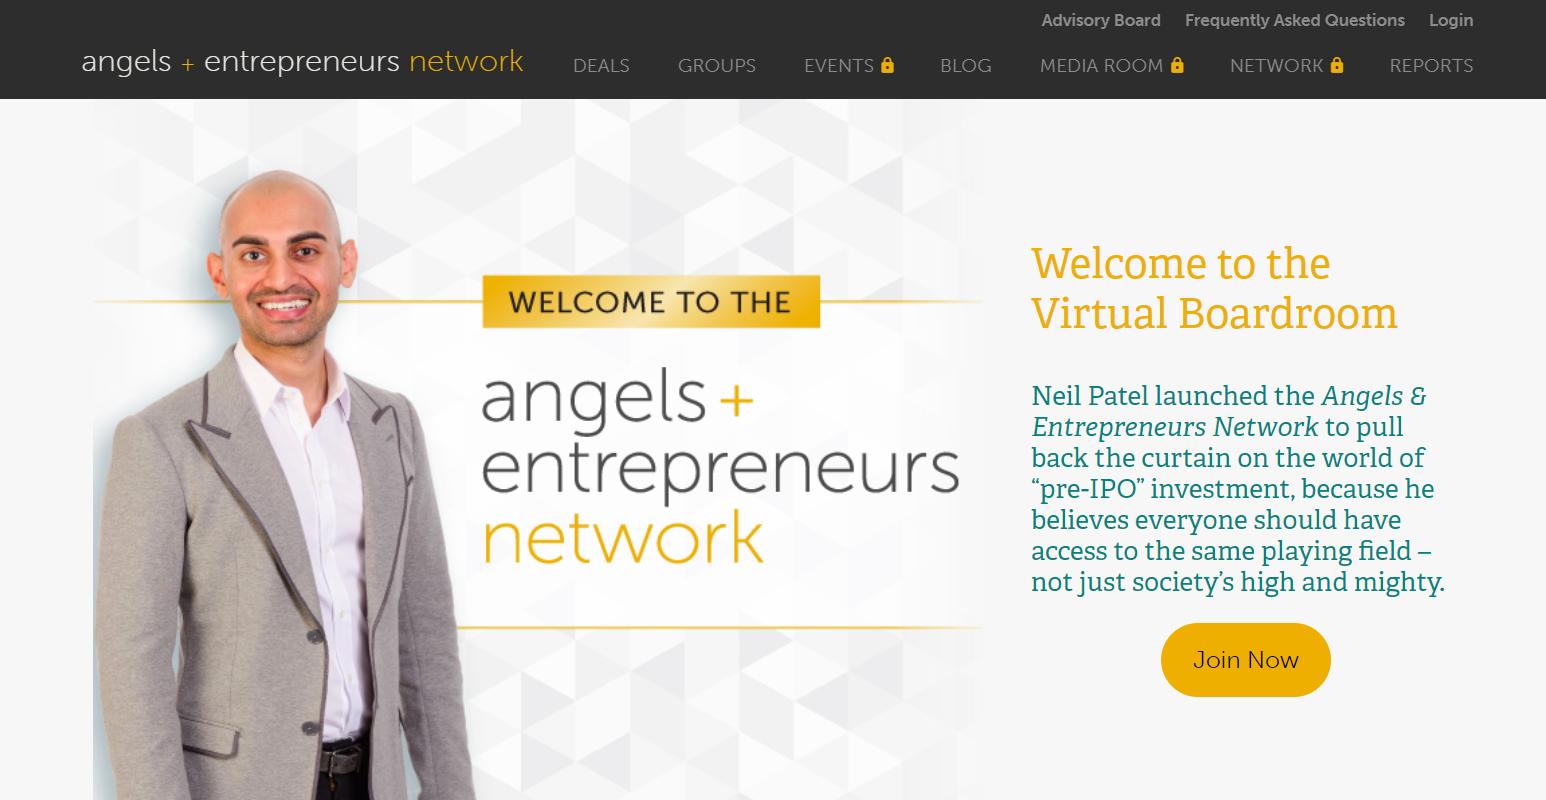 Angels and Entrepreneurs Network